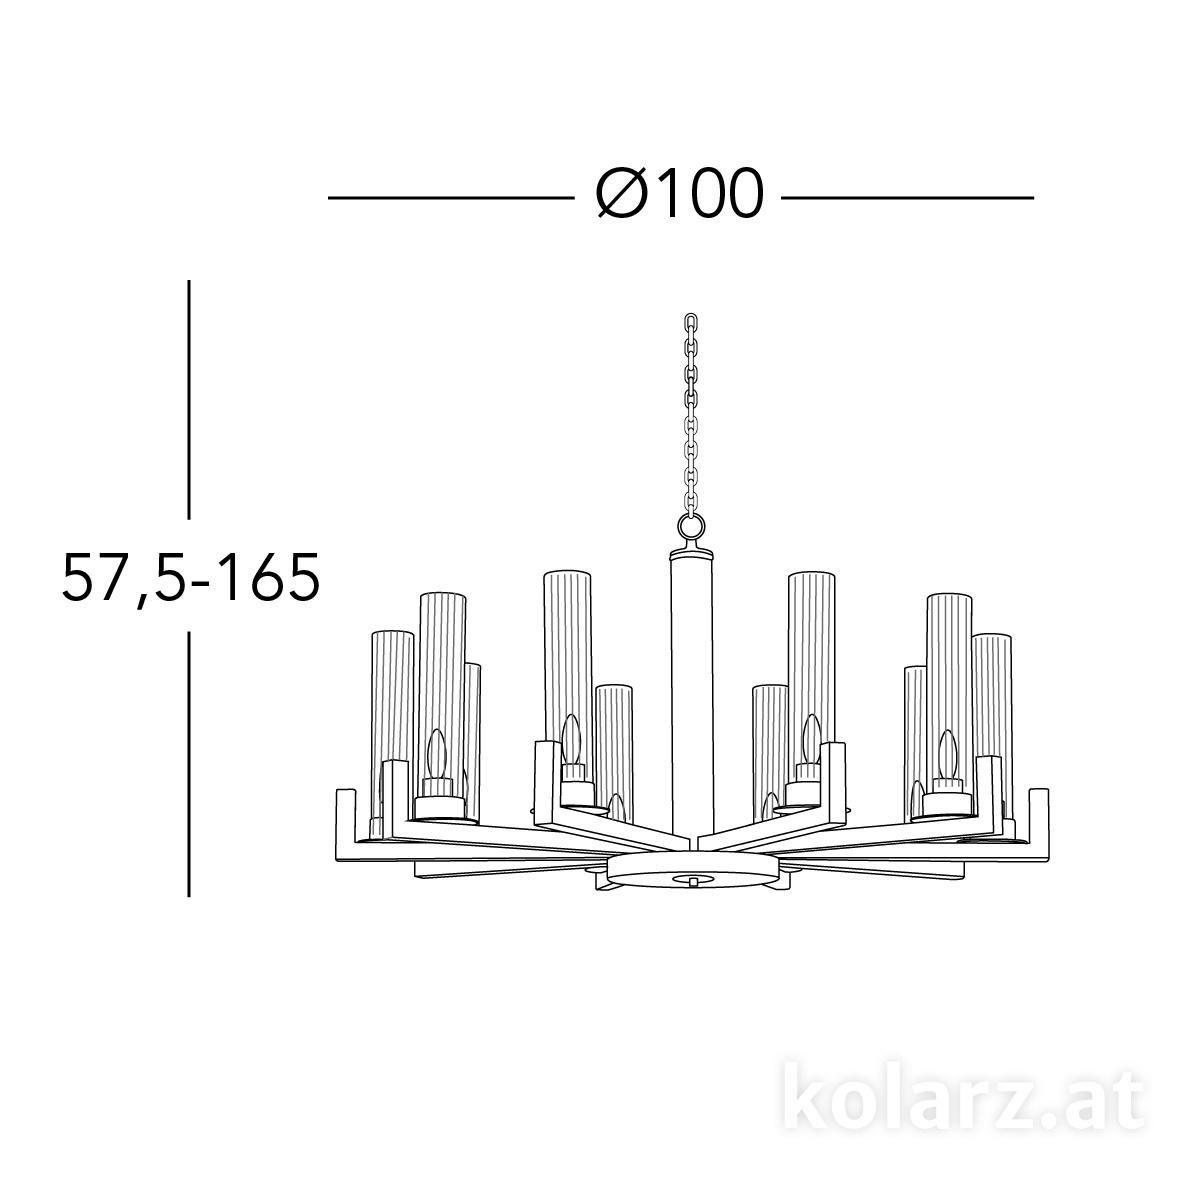 6009-81030-s1.jpg